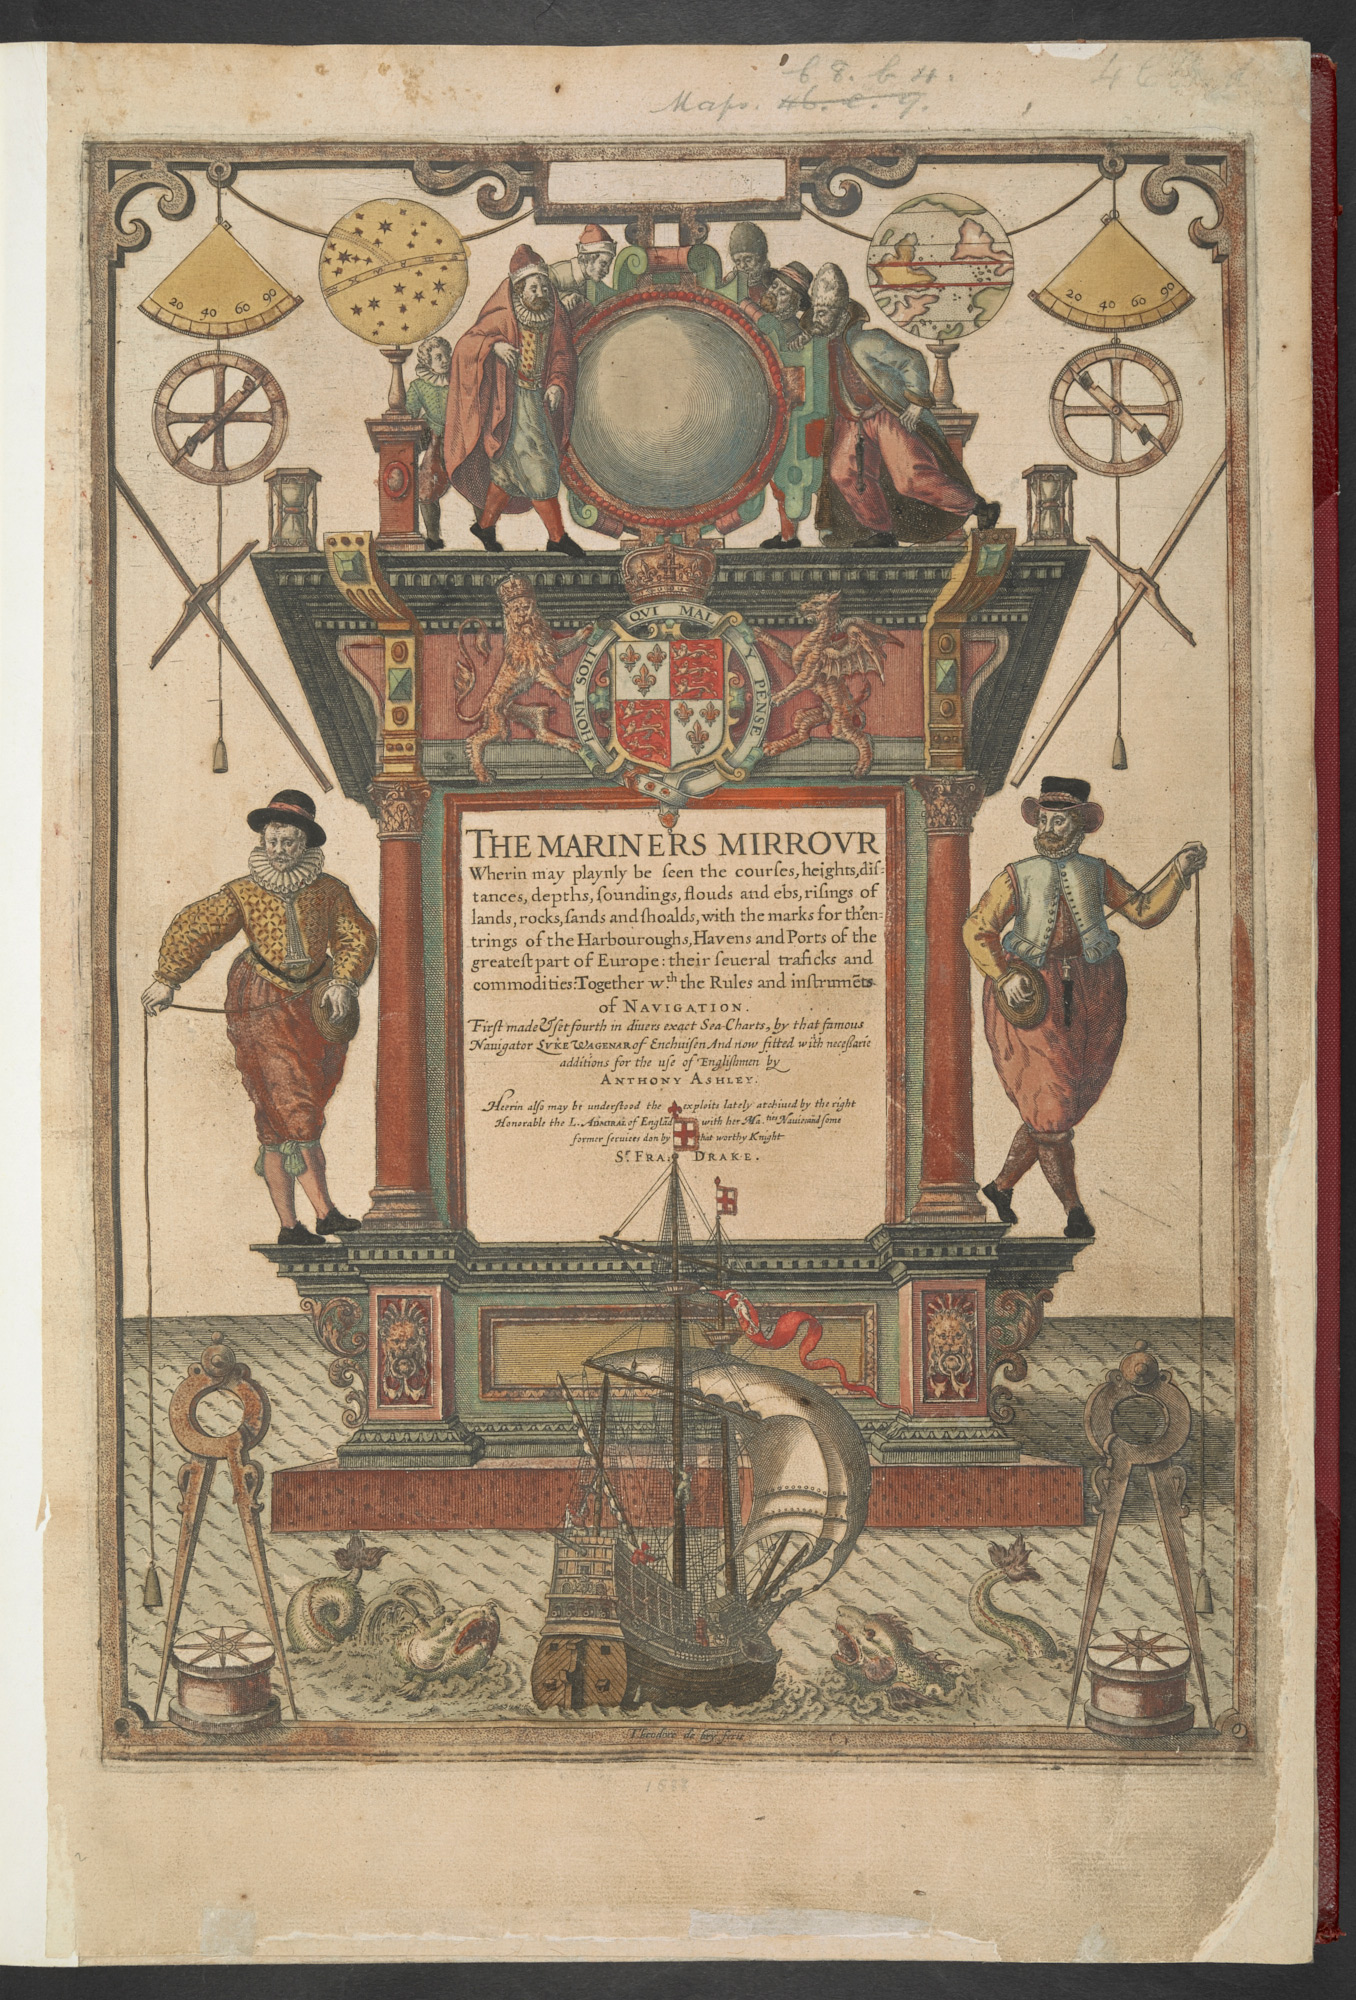 The Mariner's Mirrour, 1588